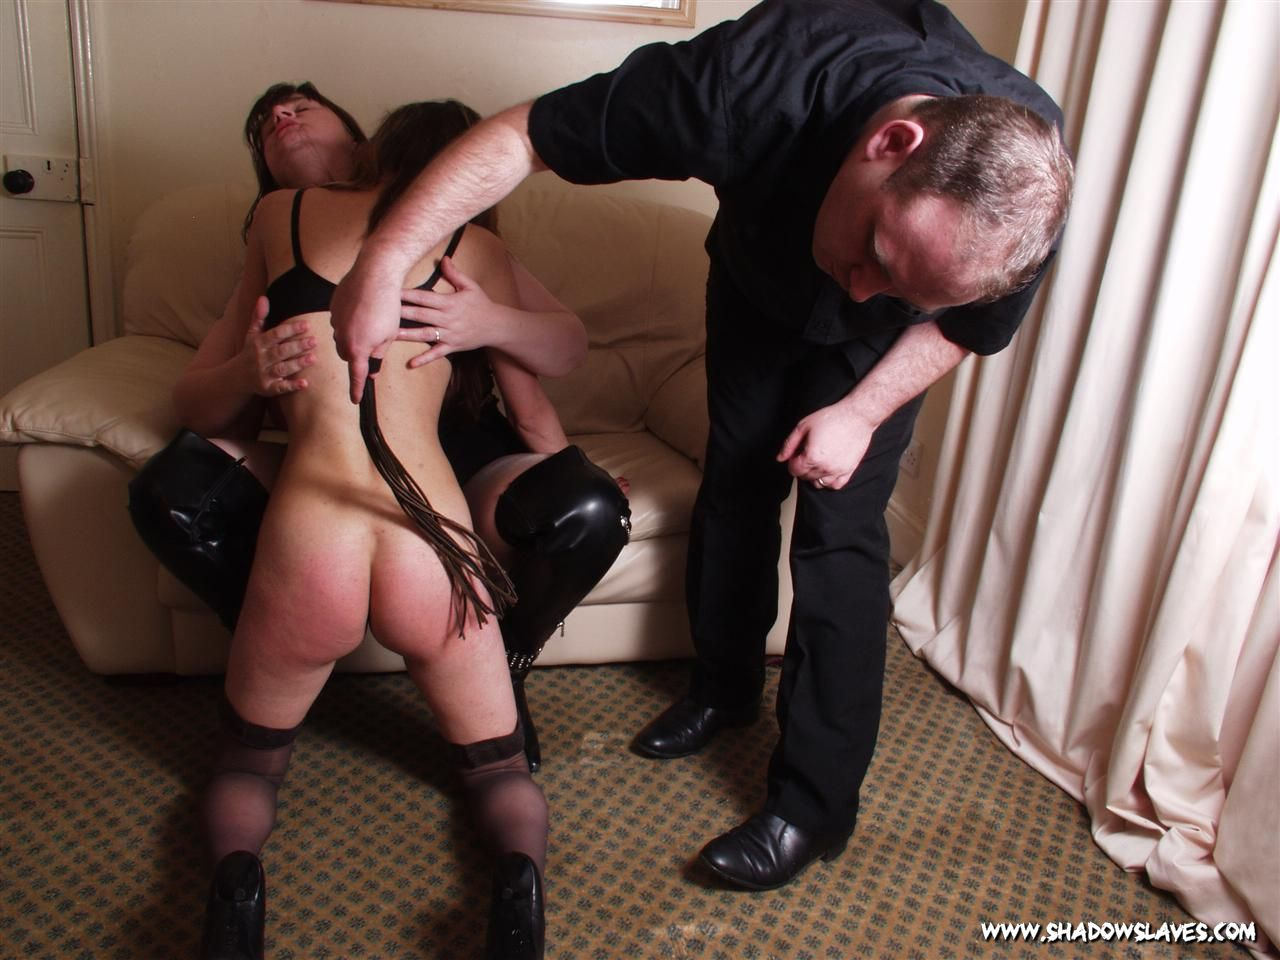 Emmas double domination and spanking